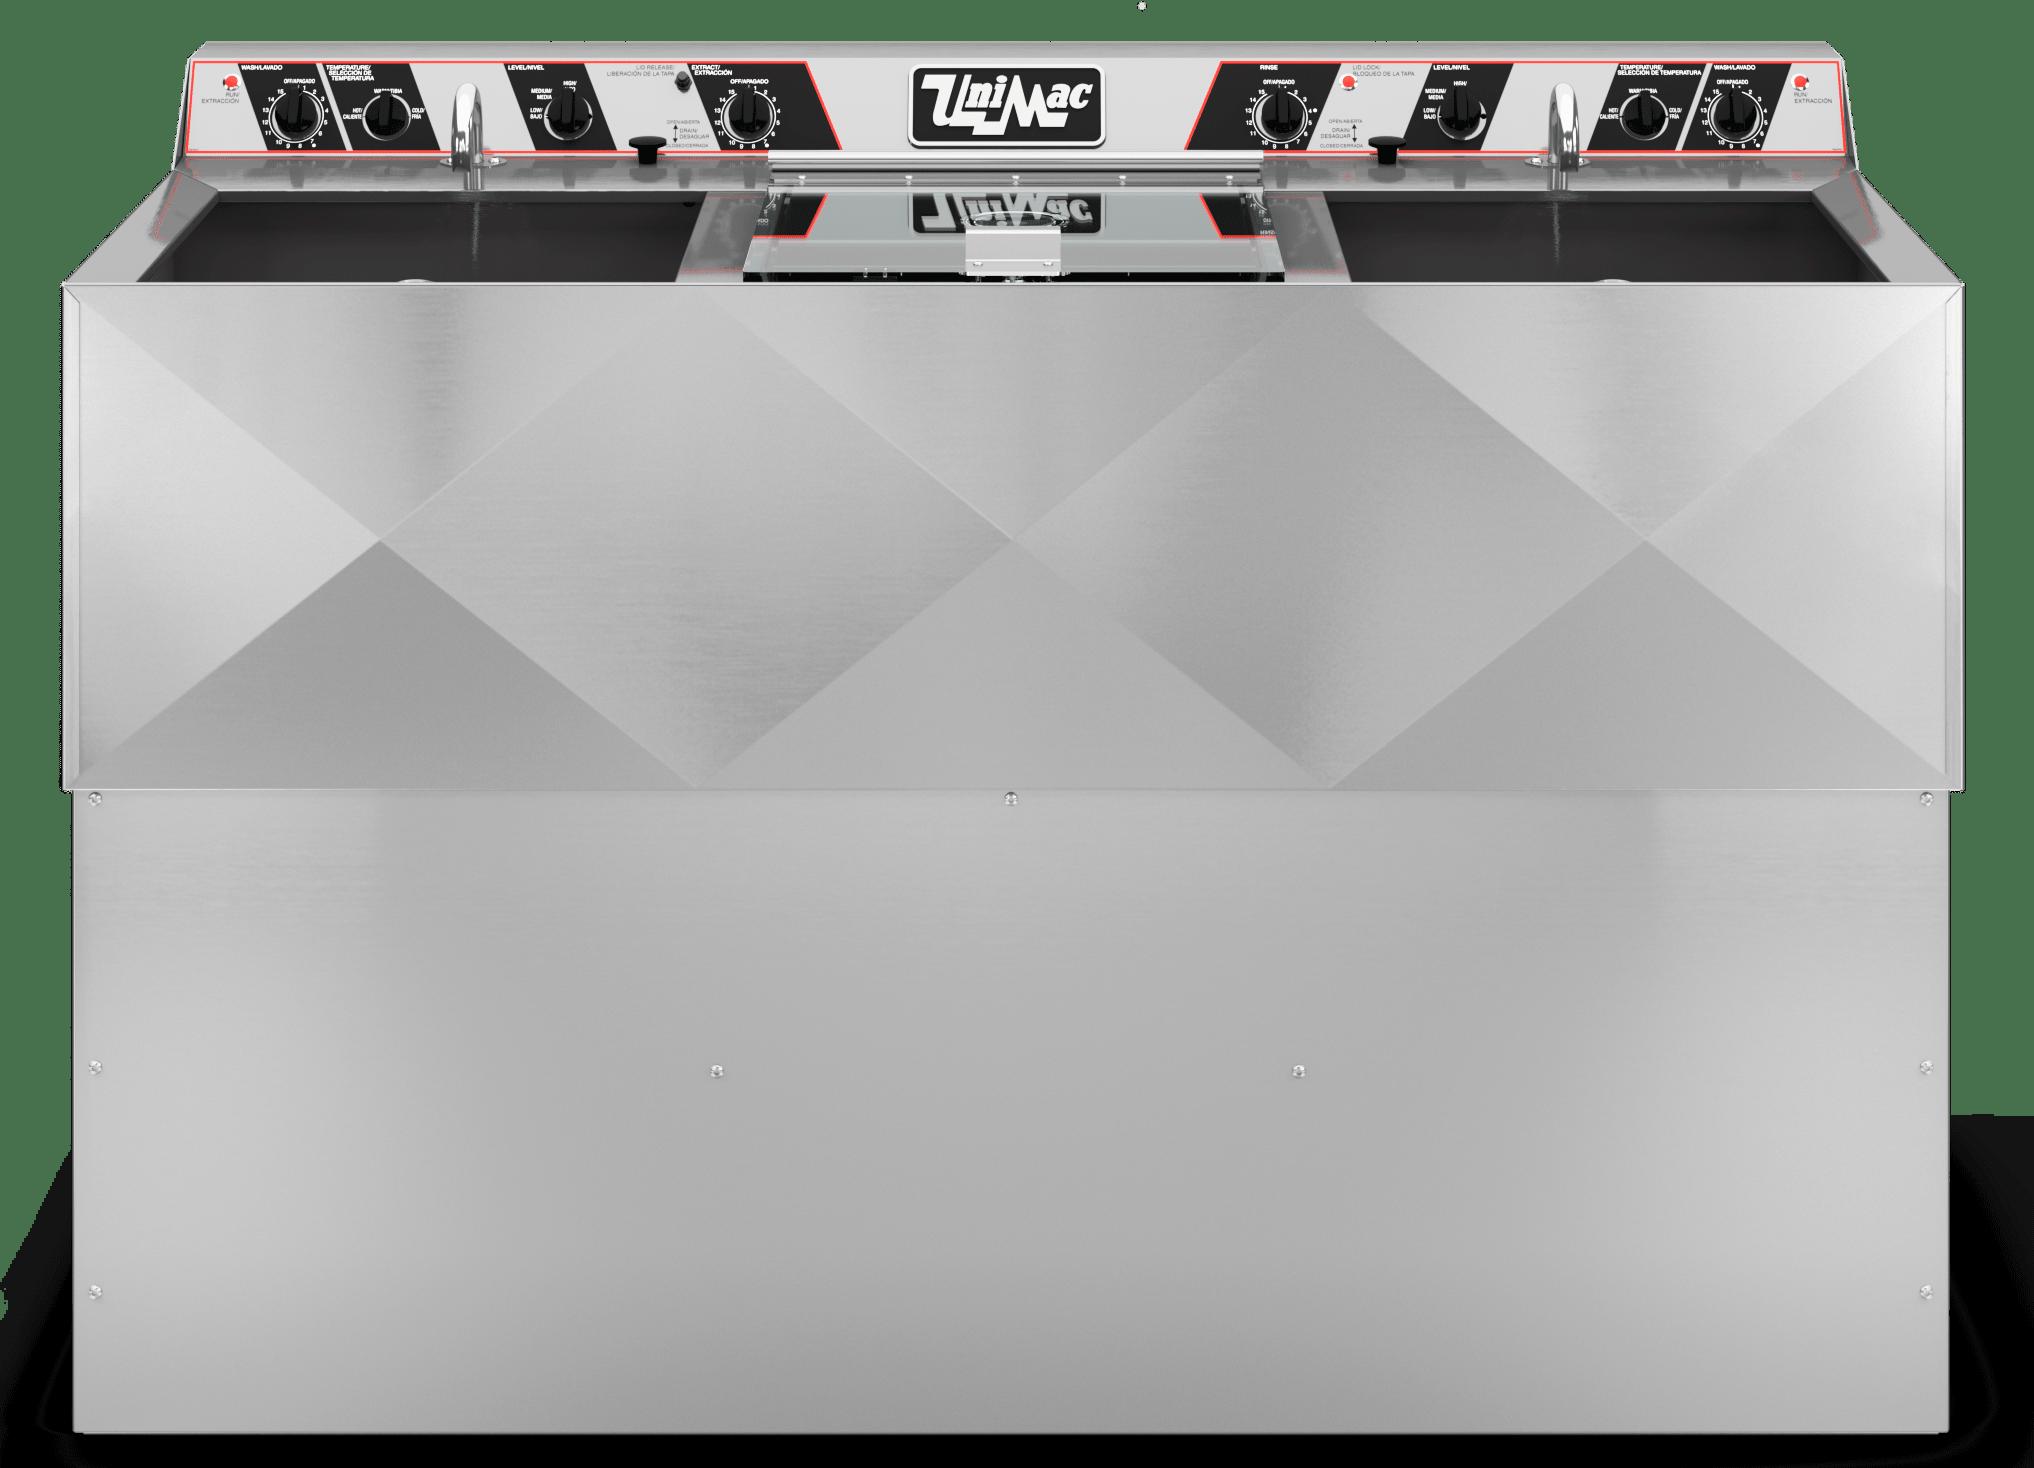 UniMac Car Wash — Washer-Extractor